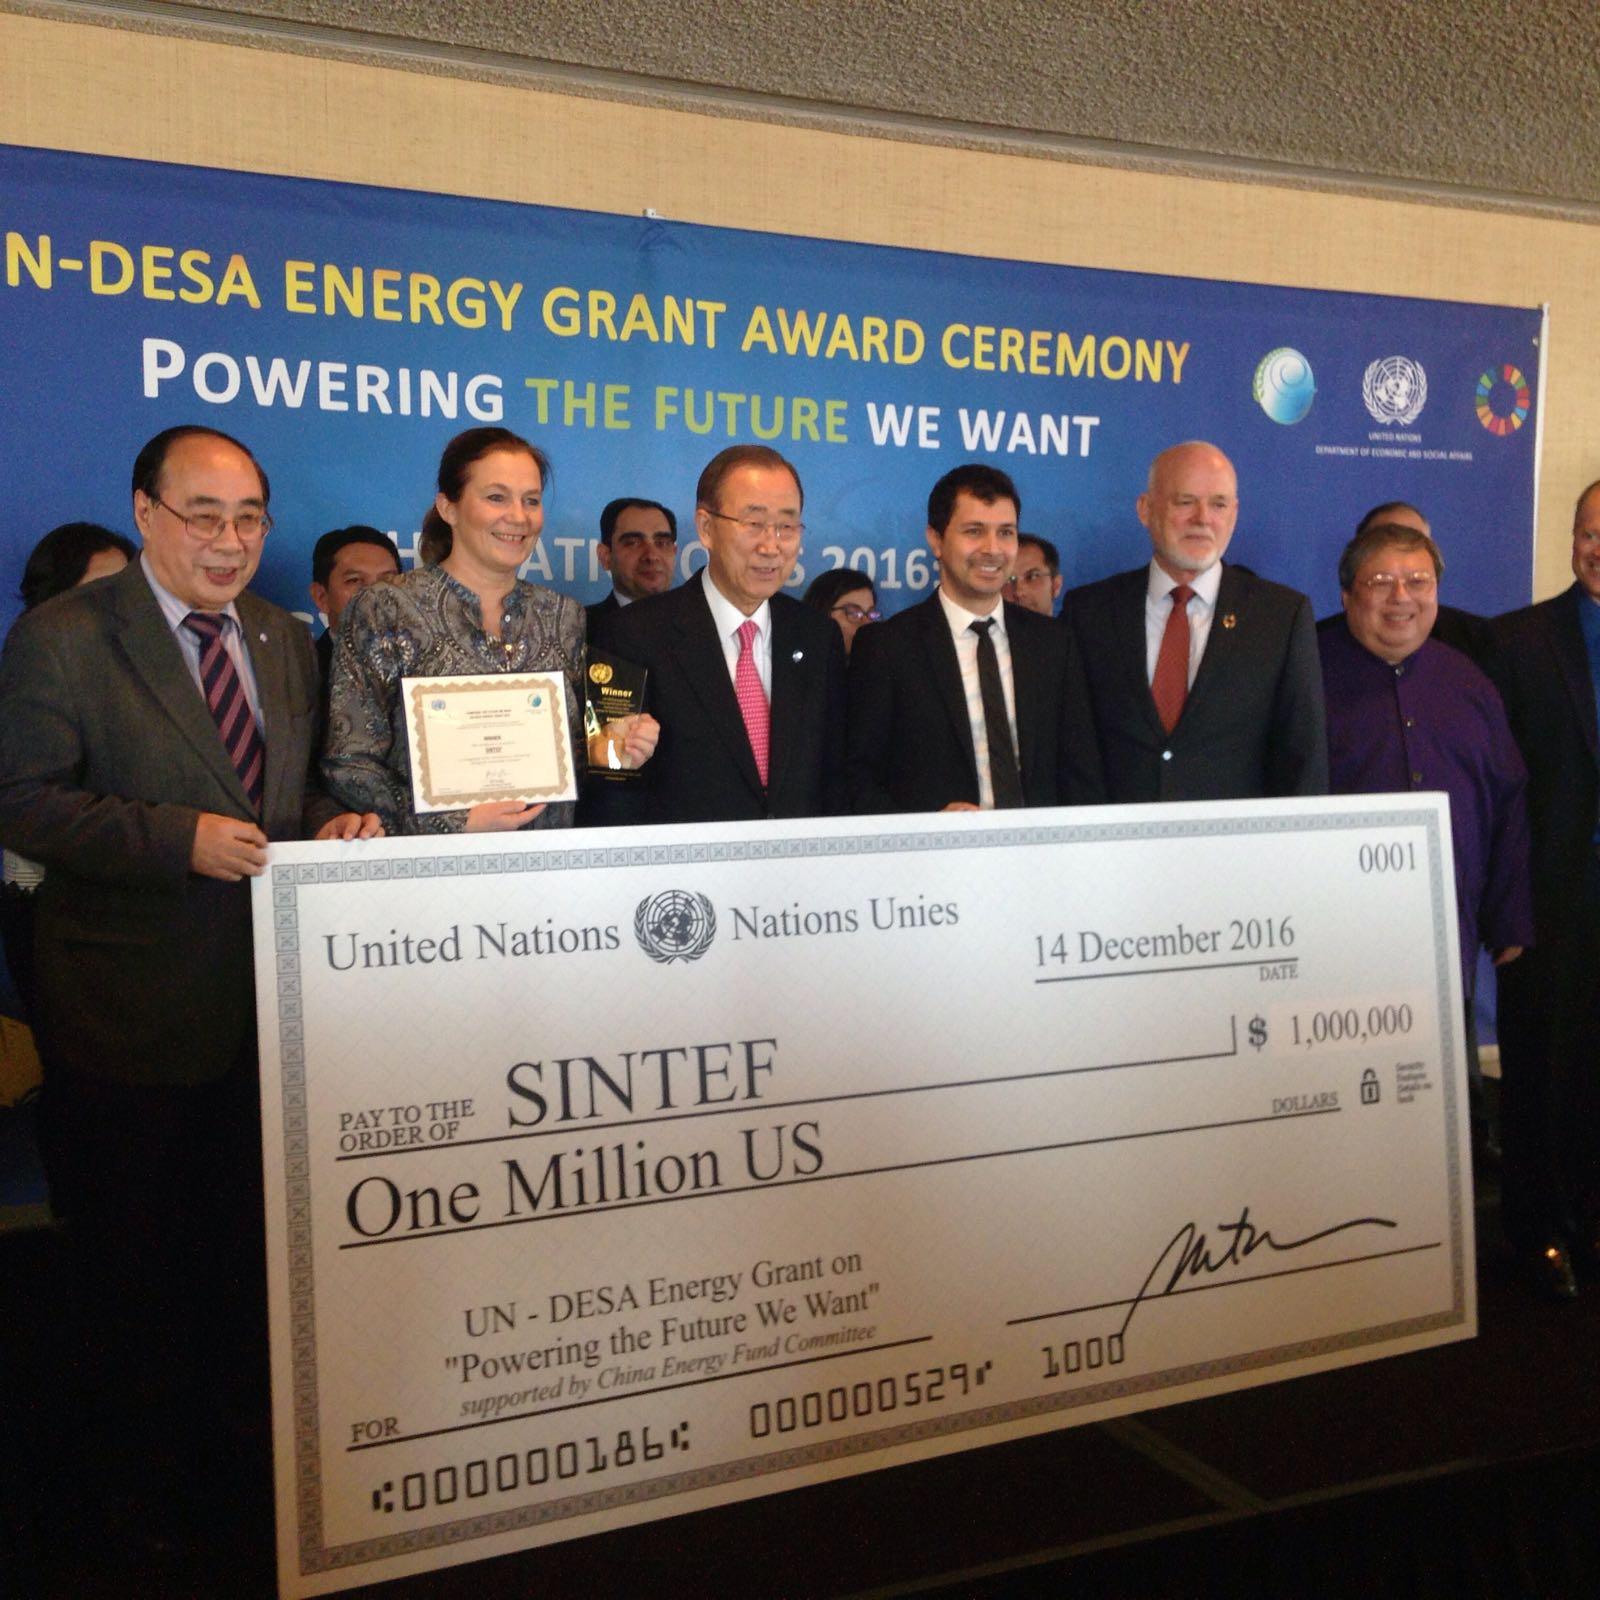 DESA Energy Grant